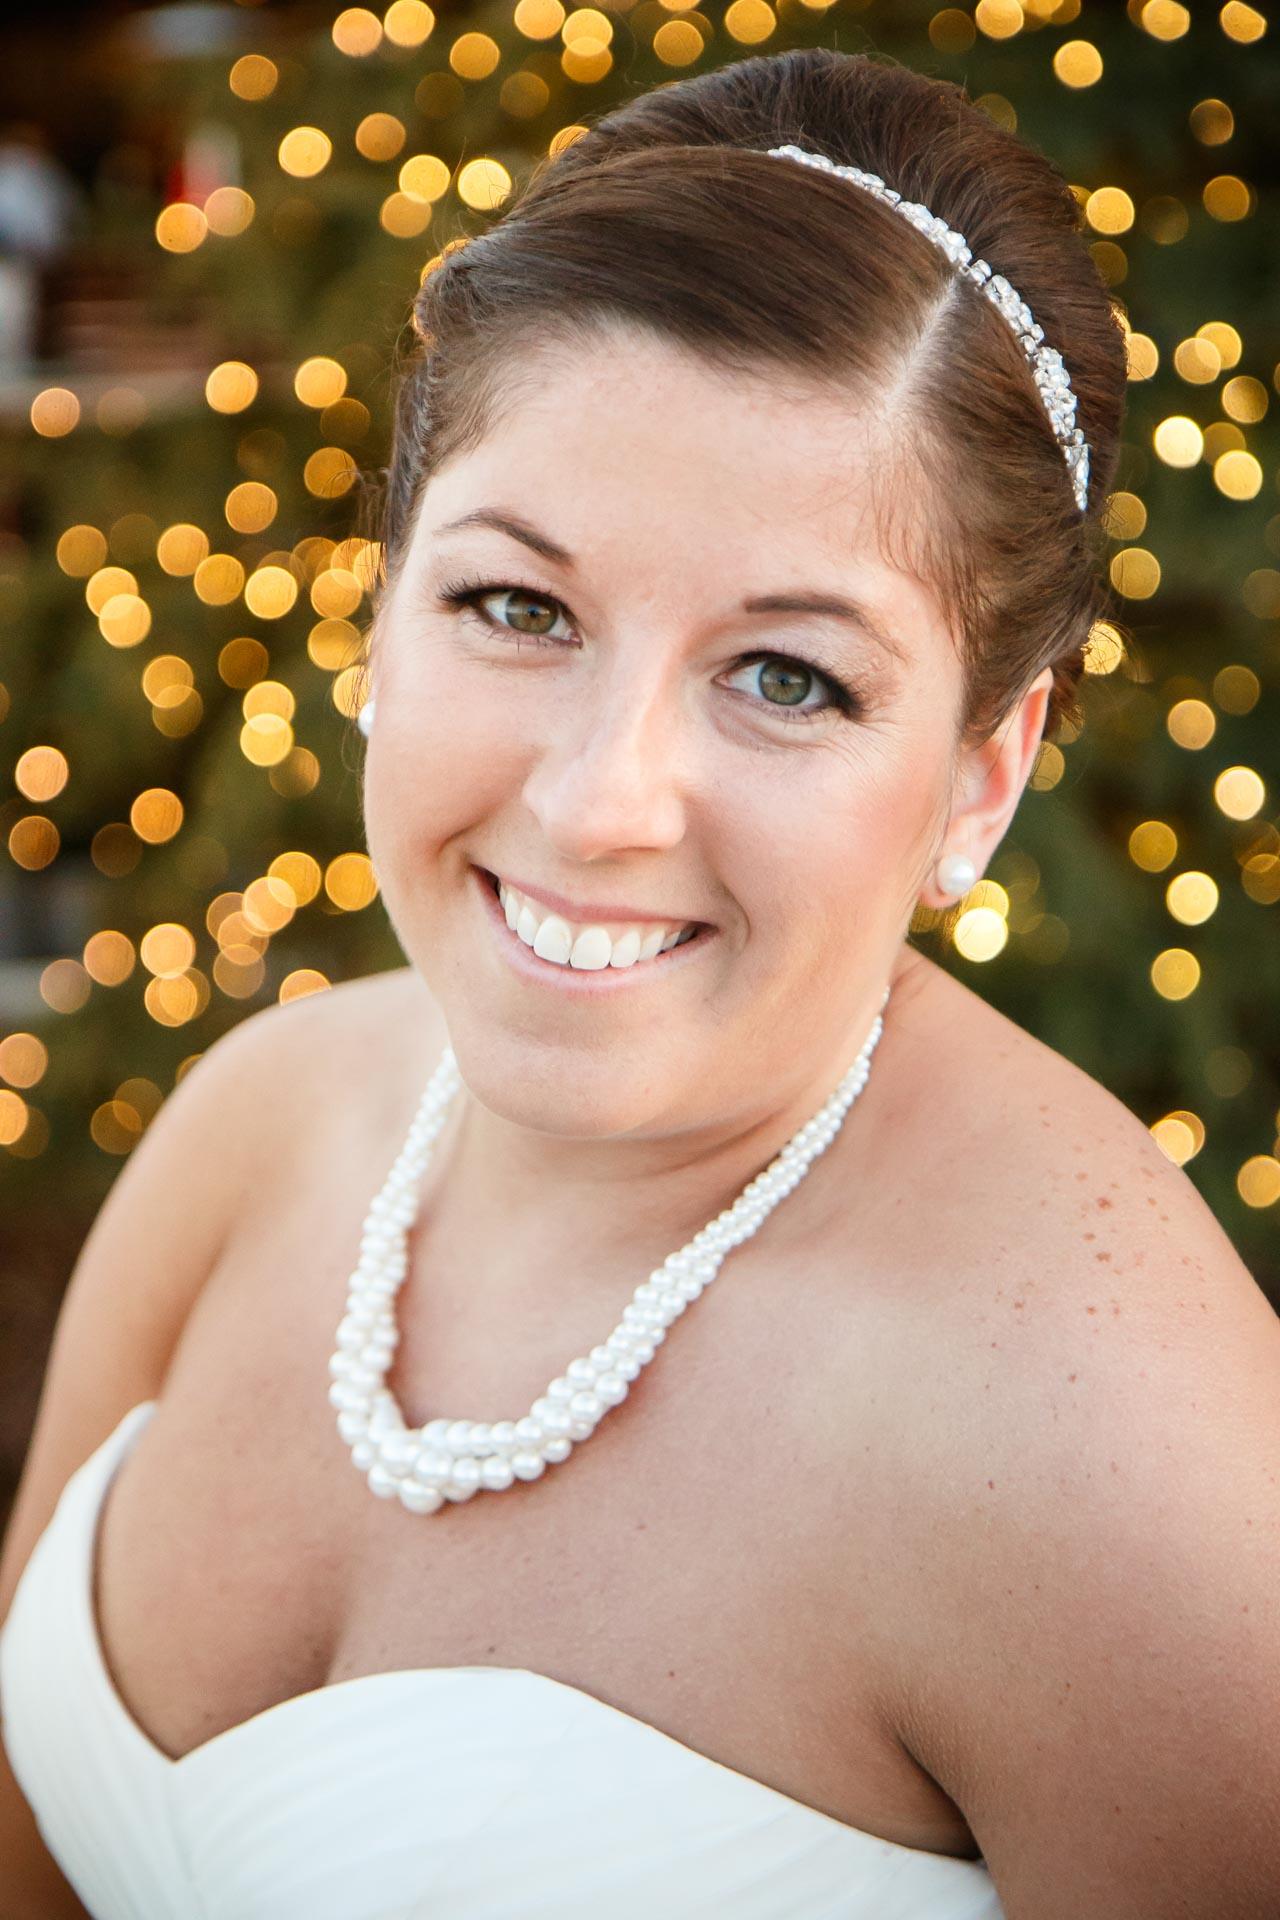 wedding-2-adam-shea-photography-green-bay-appleton-neenah-photographer-28.jpg